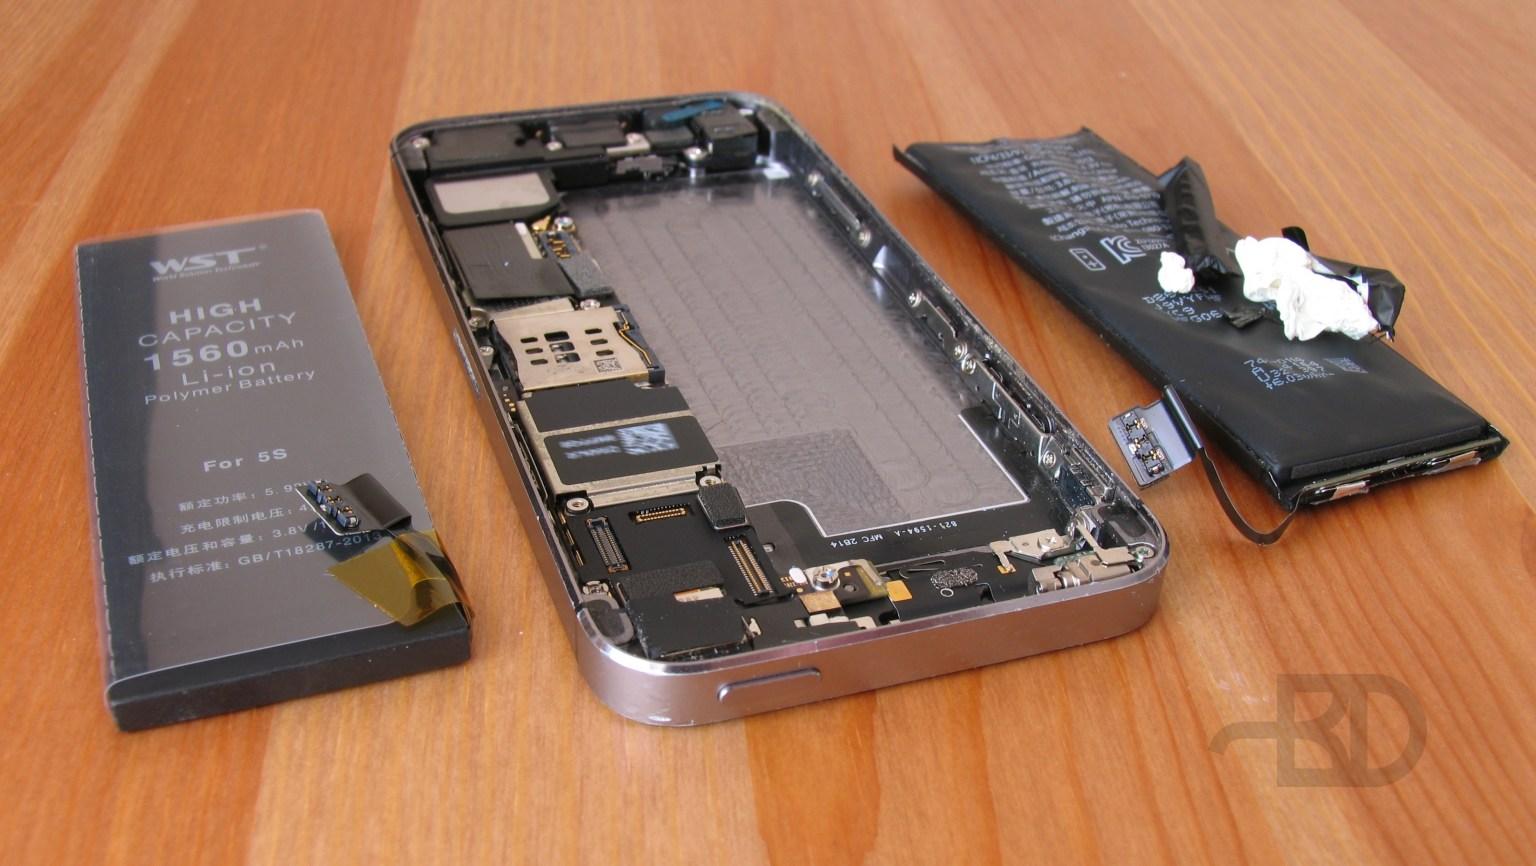 Замена аккумулятора в iPhone 5S